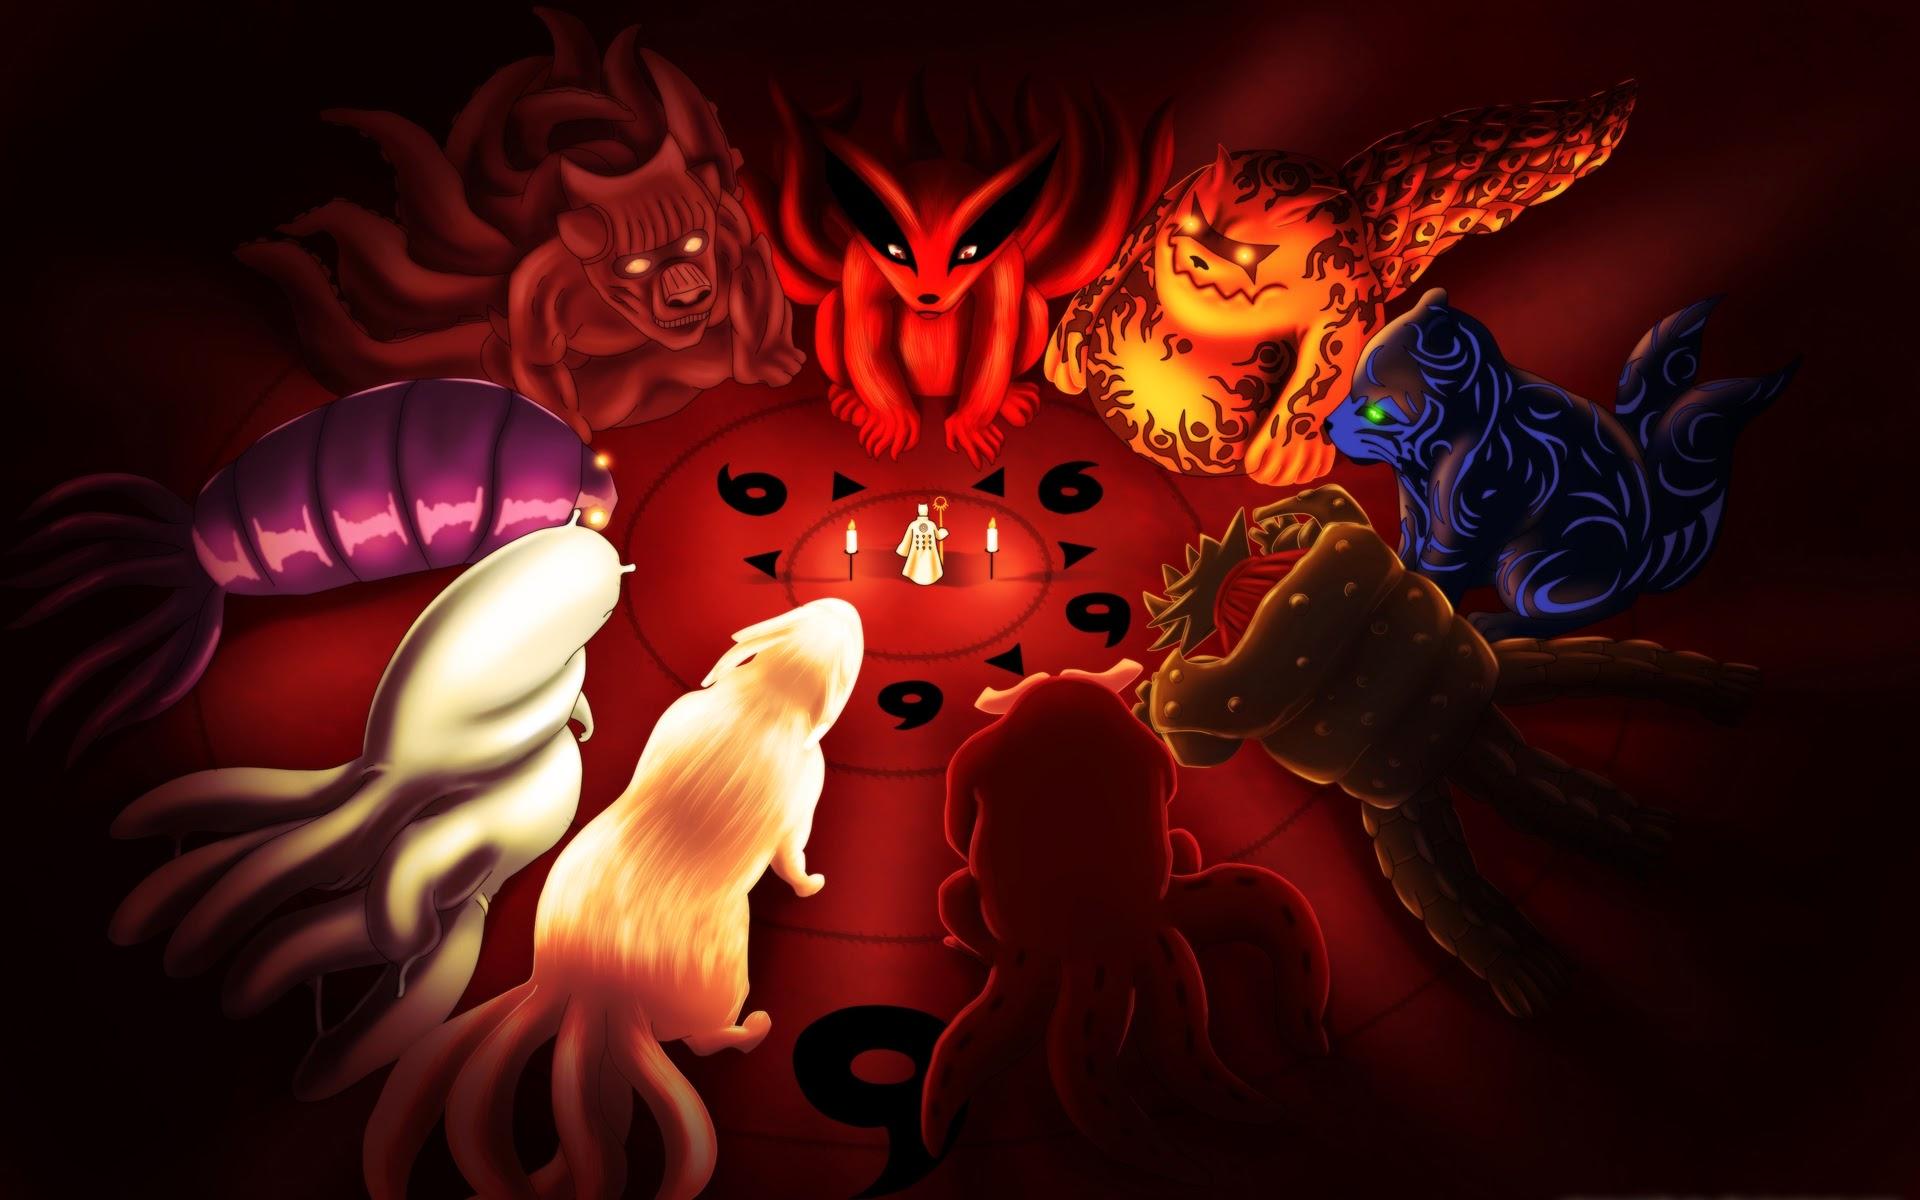 sennnin biju tailed beast anime picture hd wallpaper 1920x1200 05